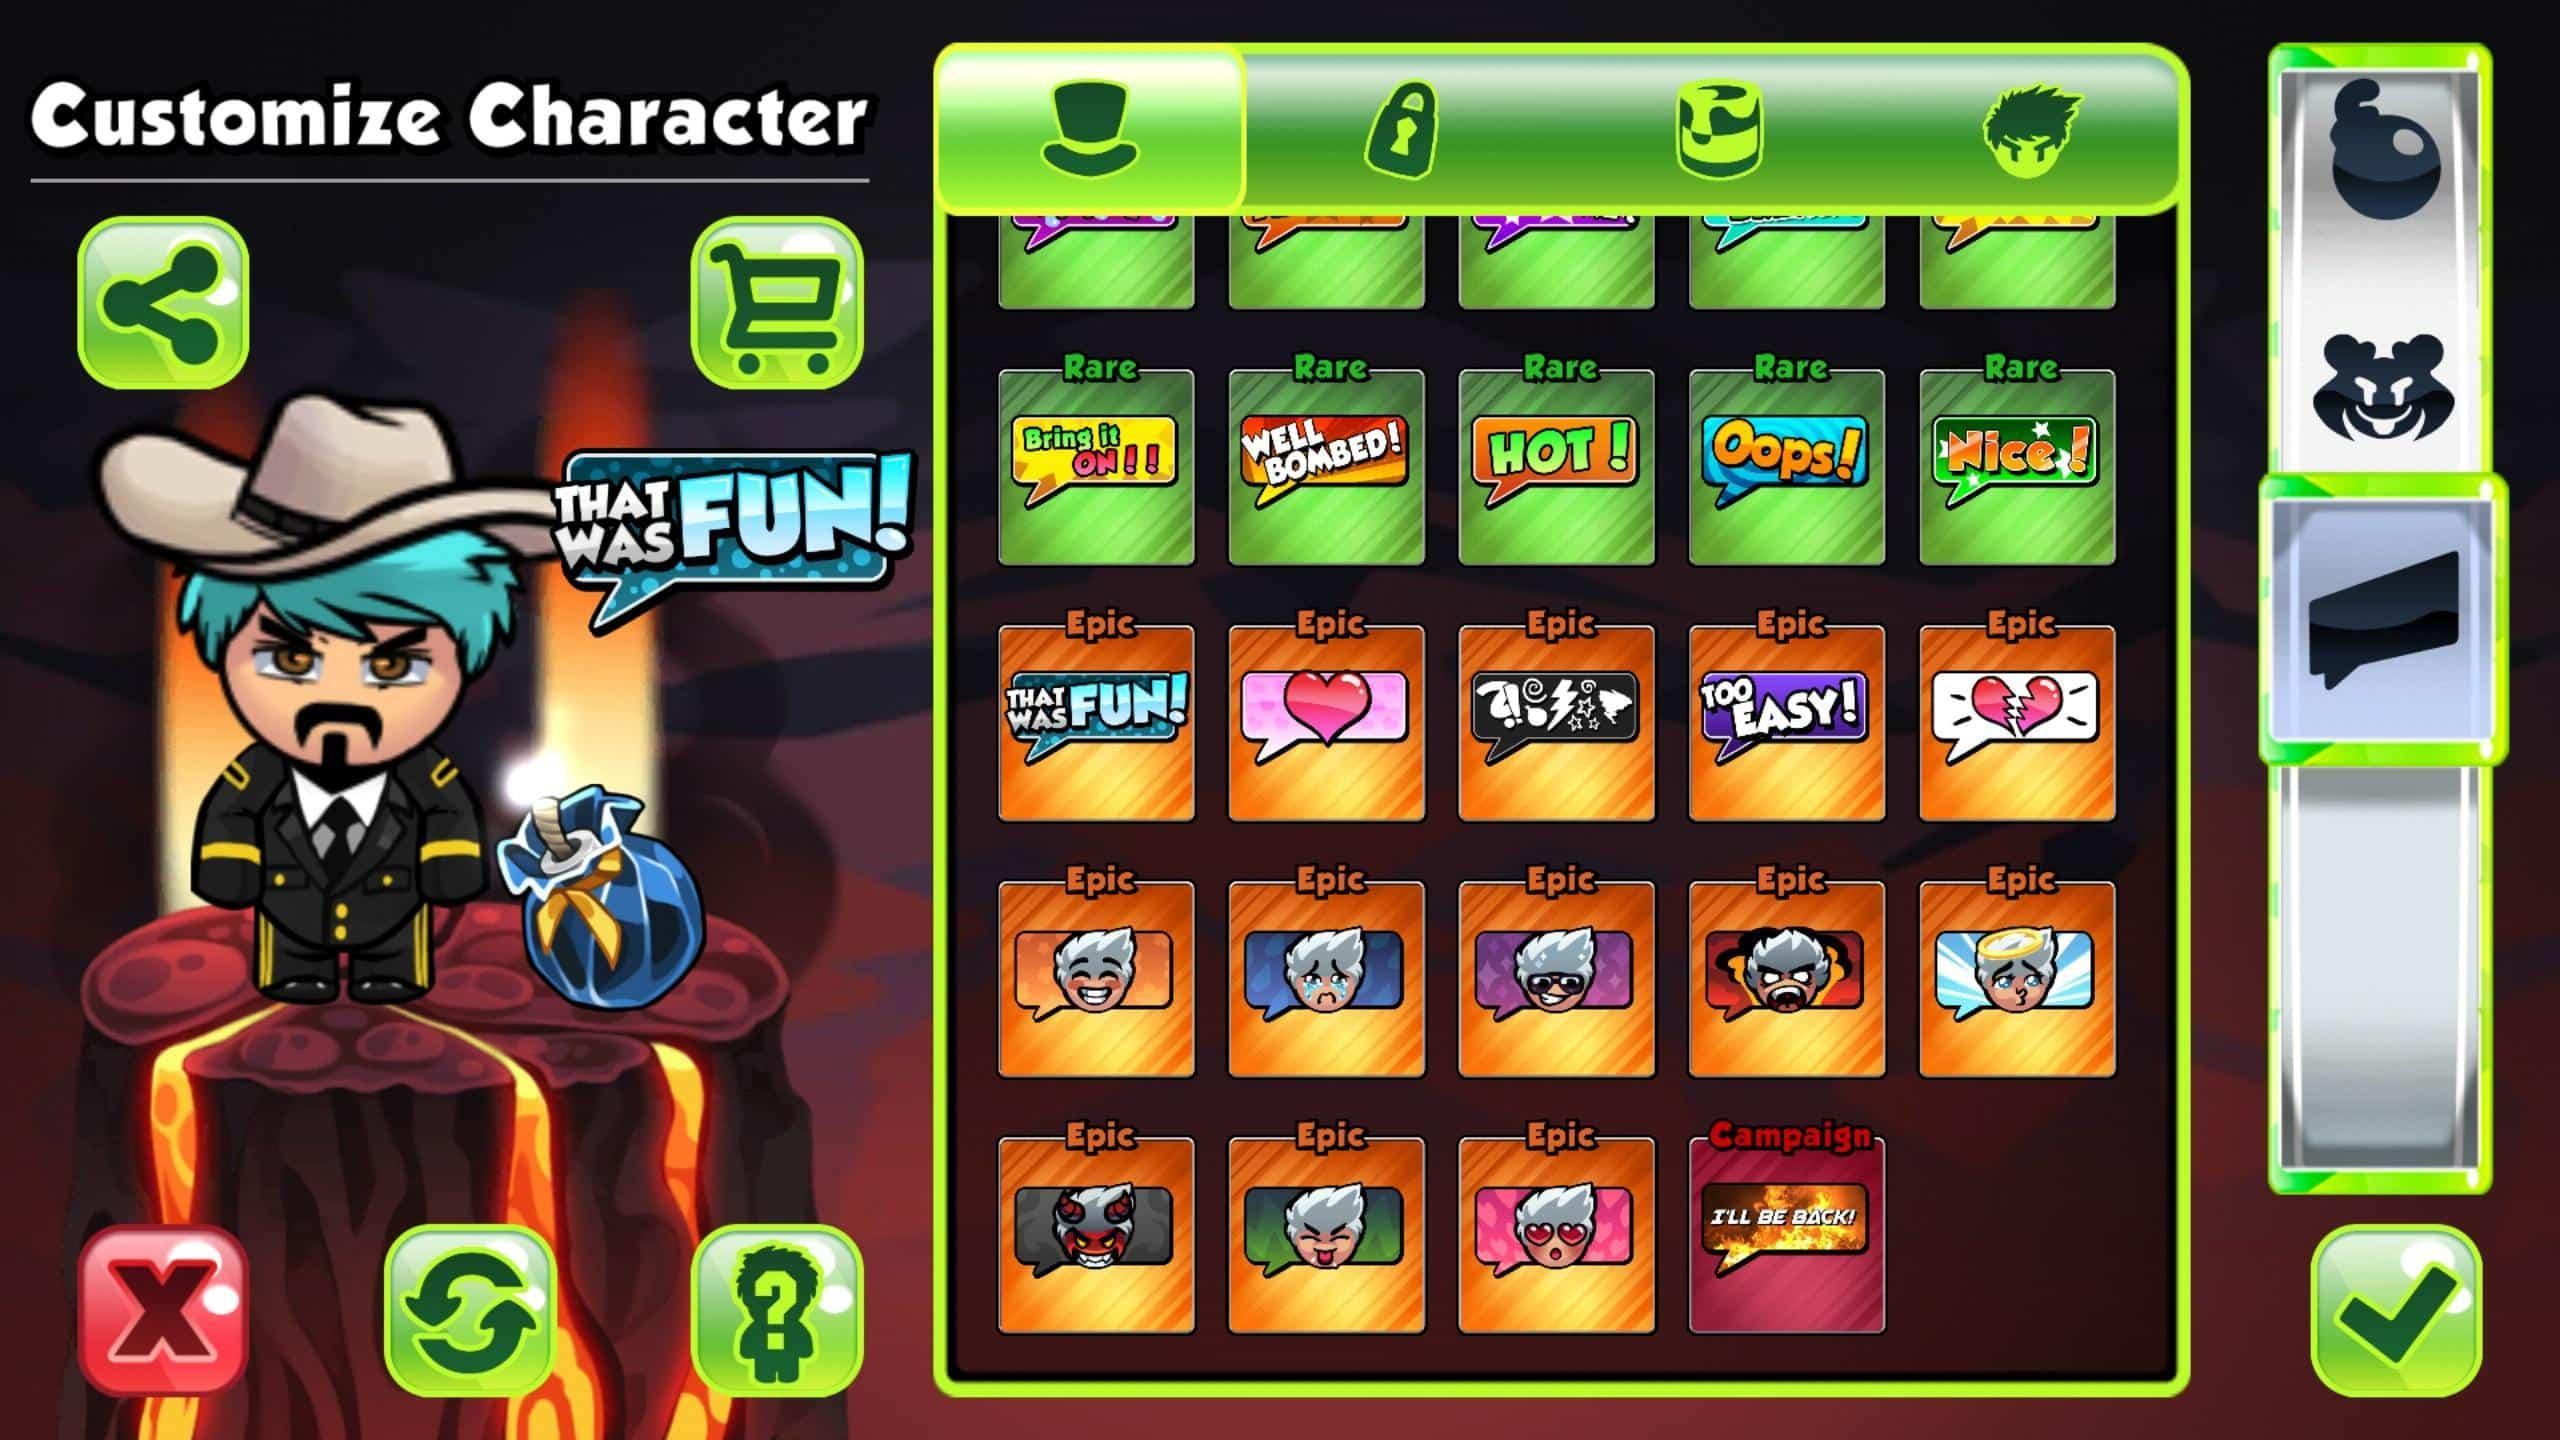 download Bomber Friends mod APK